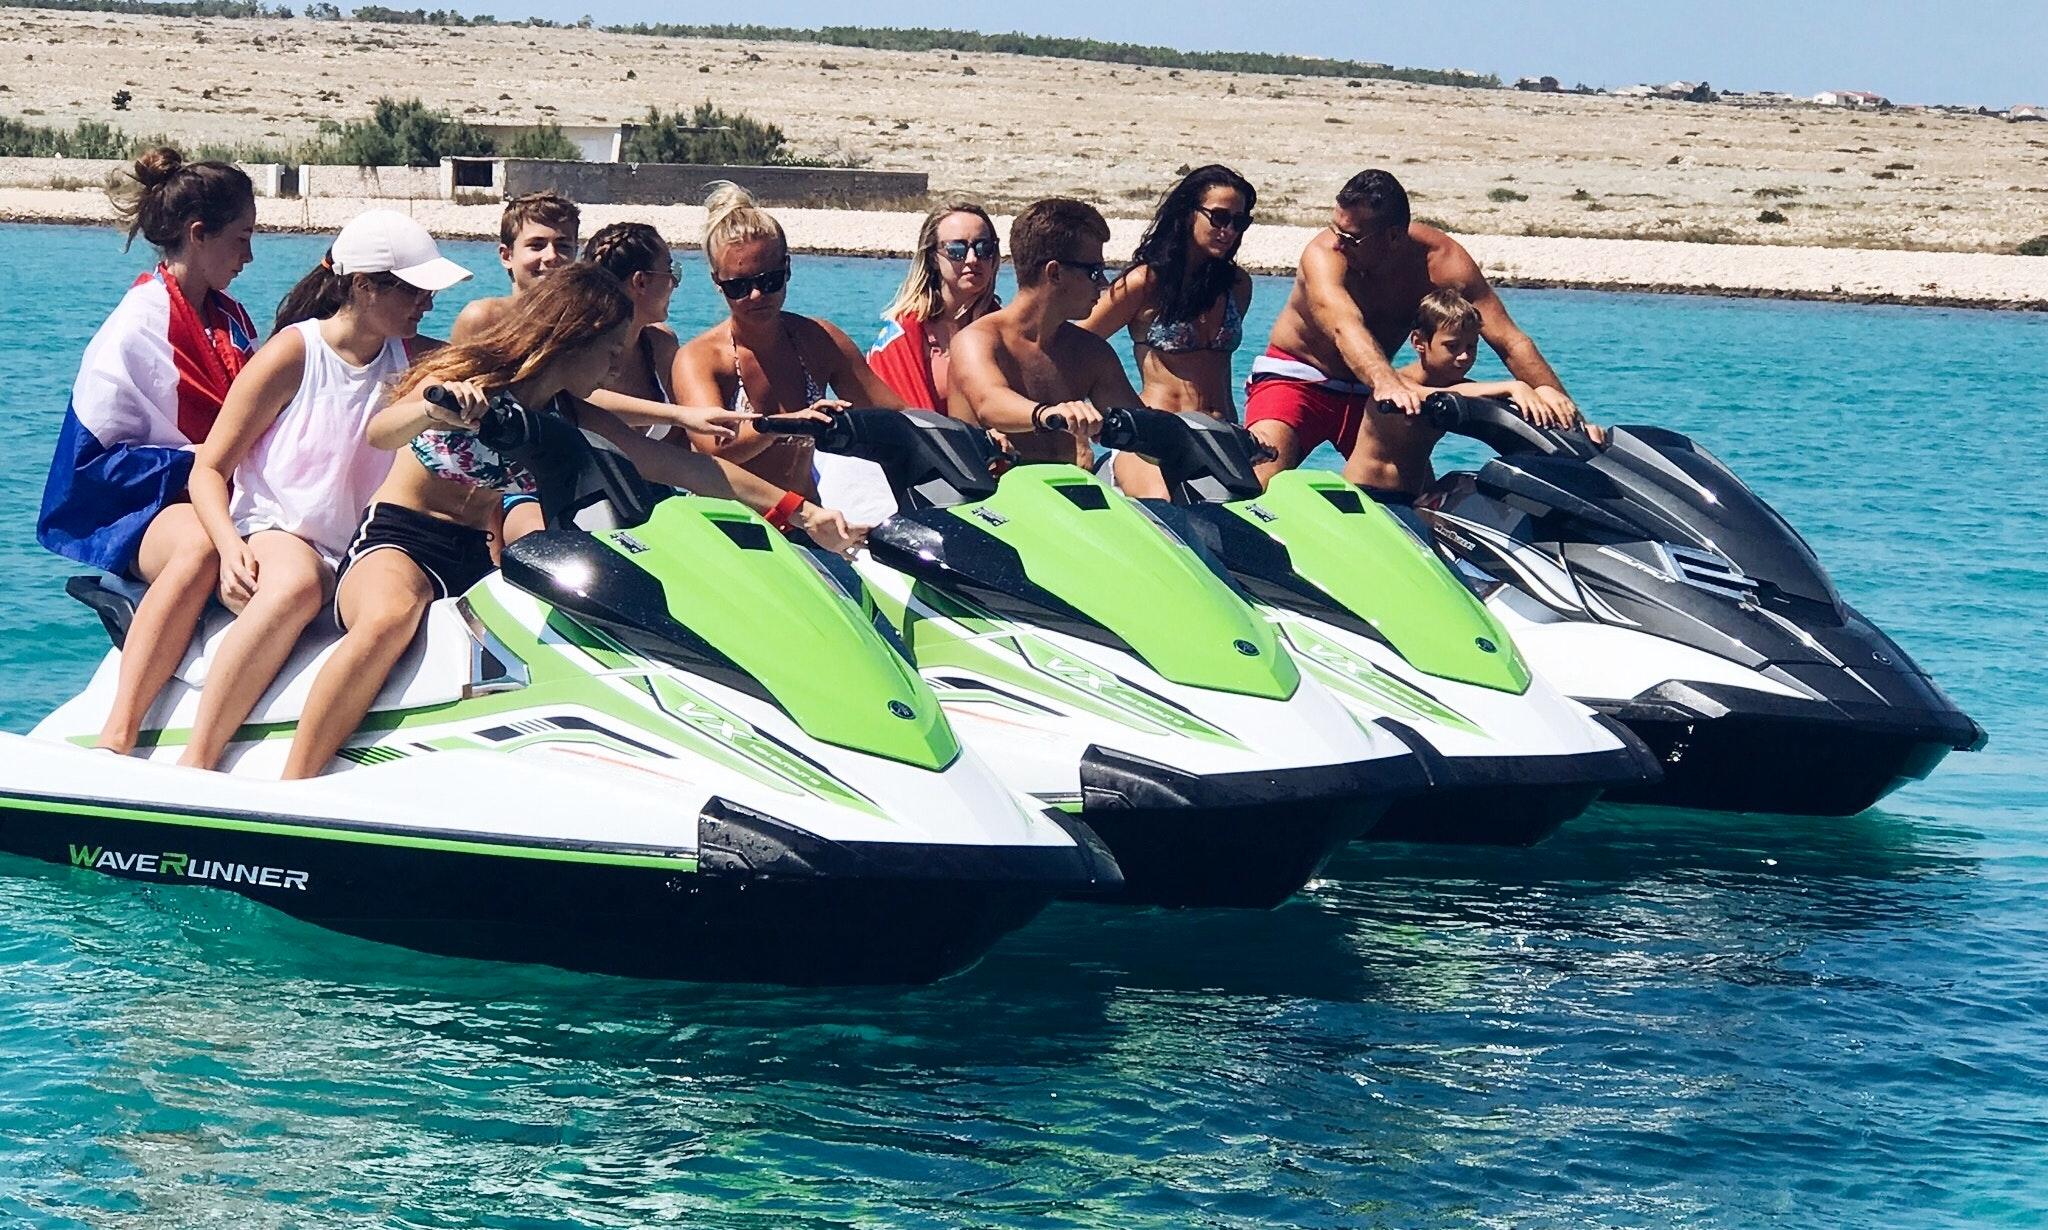 Jet Ski Rental For 2 People In Razanac Croatia Getmyboat